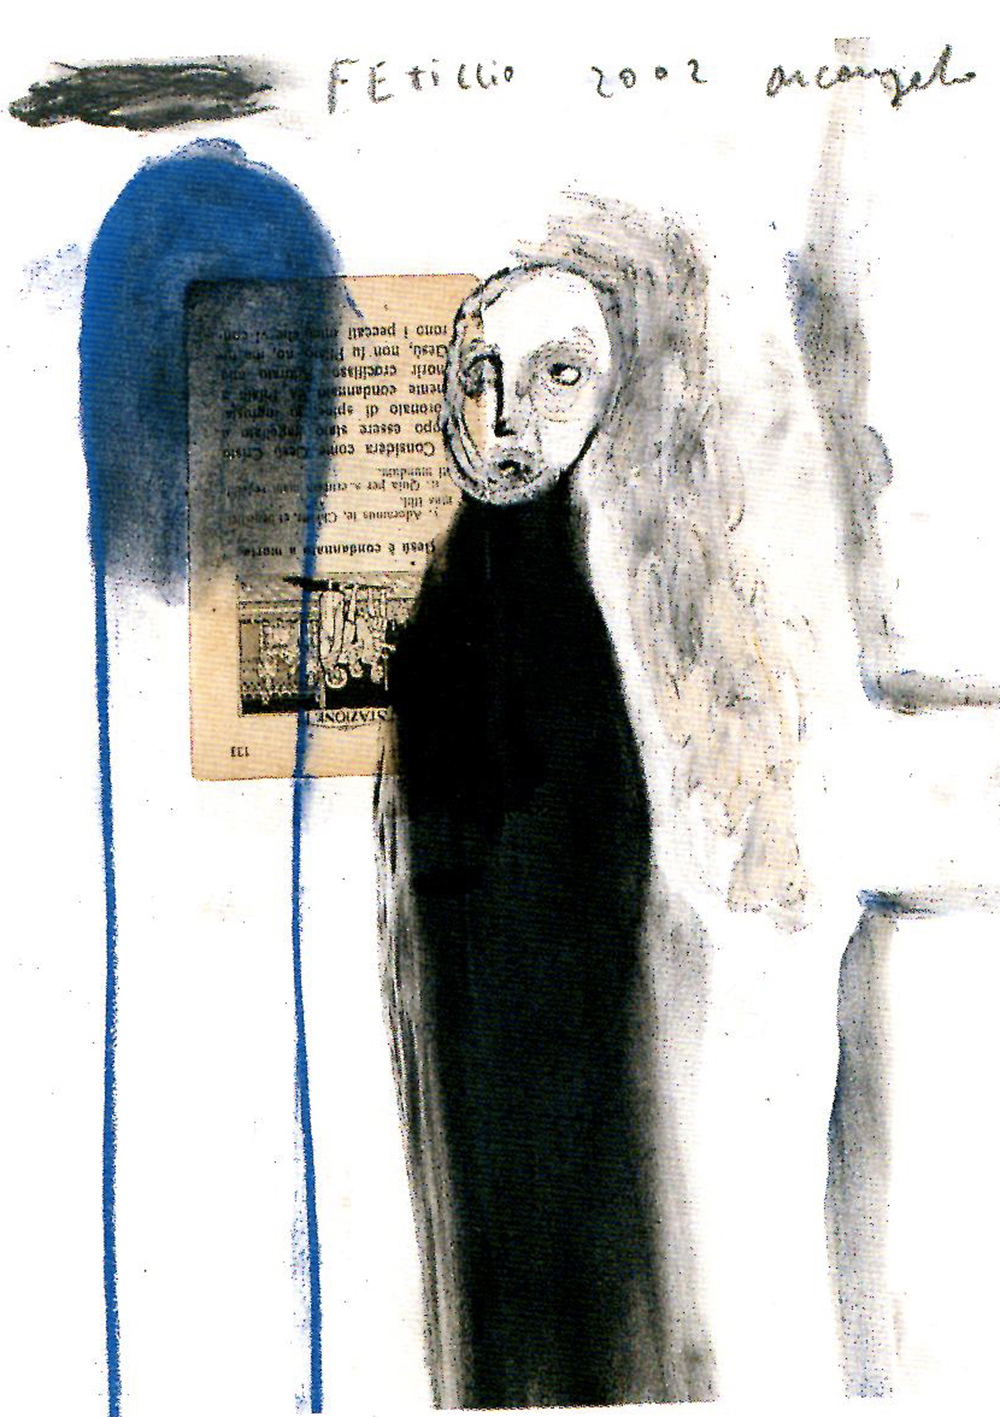 Feticcio, 2002, tecnica mista su carta, cm 32x24